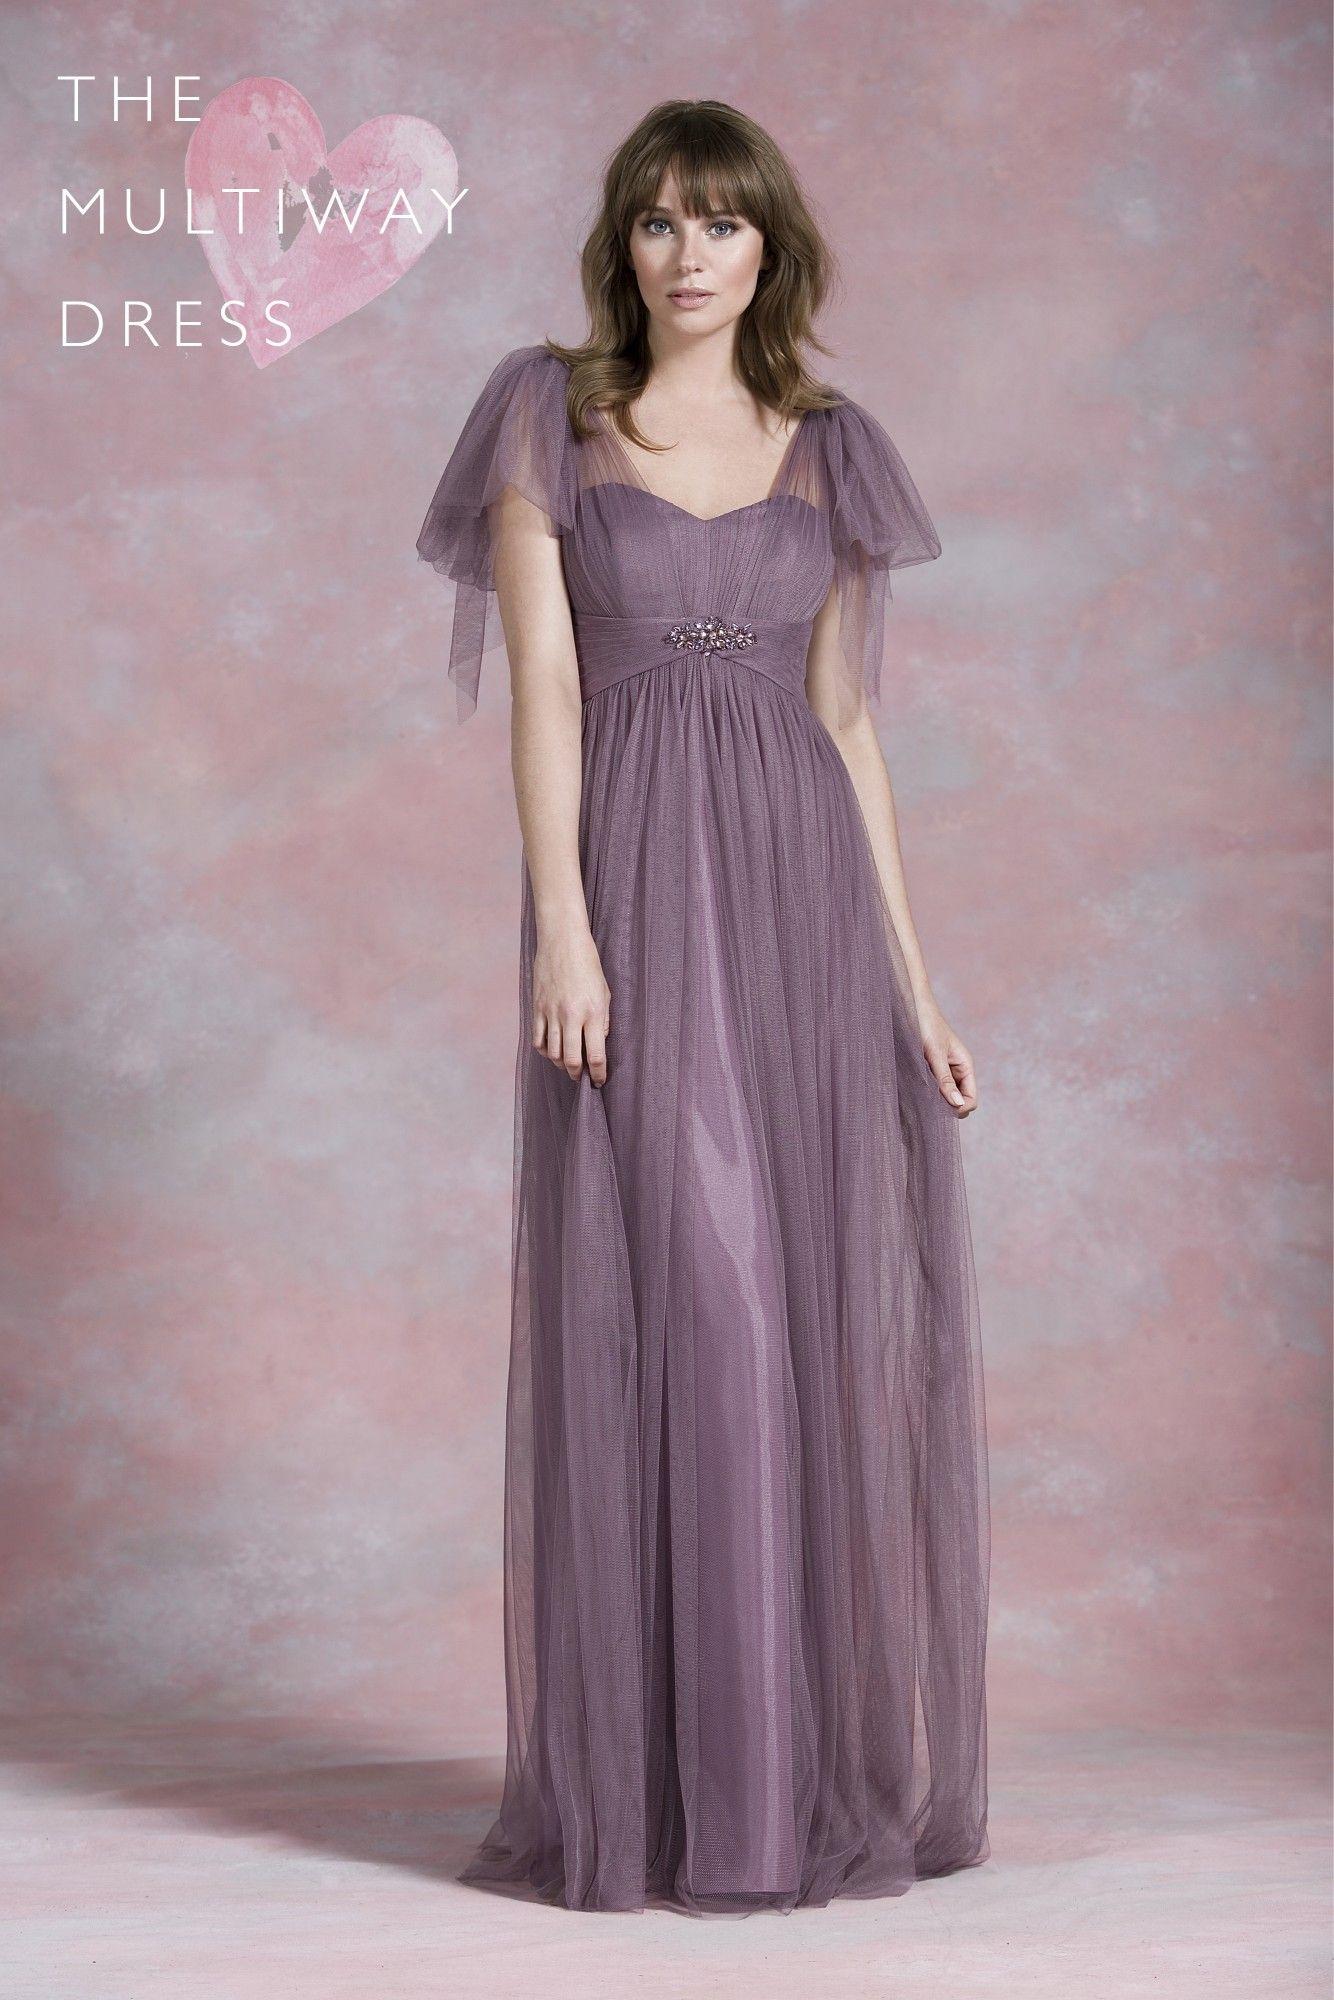 Multiway Kelsey Rose bridesmaids dress | bridesmaid dresses ...